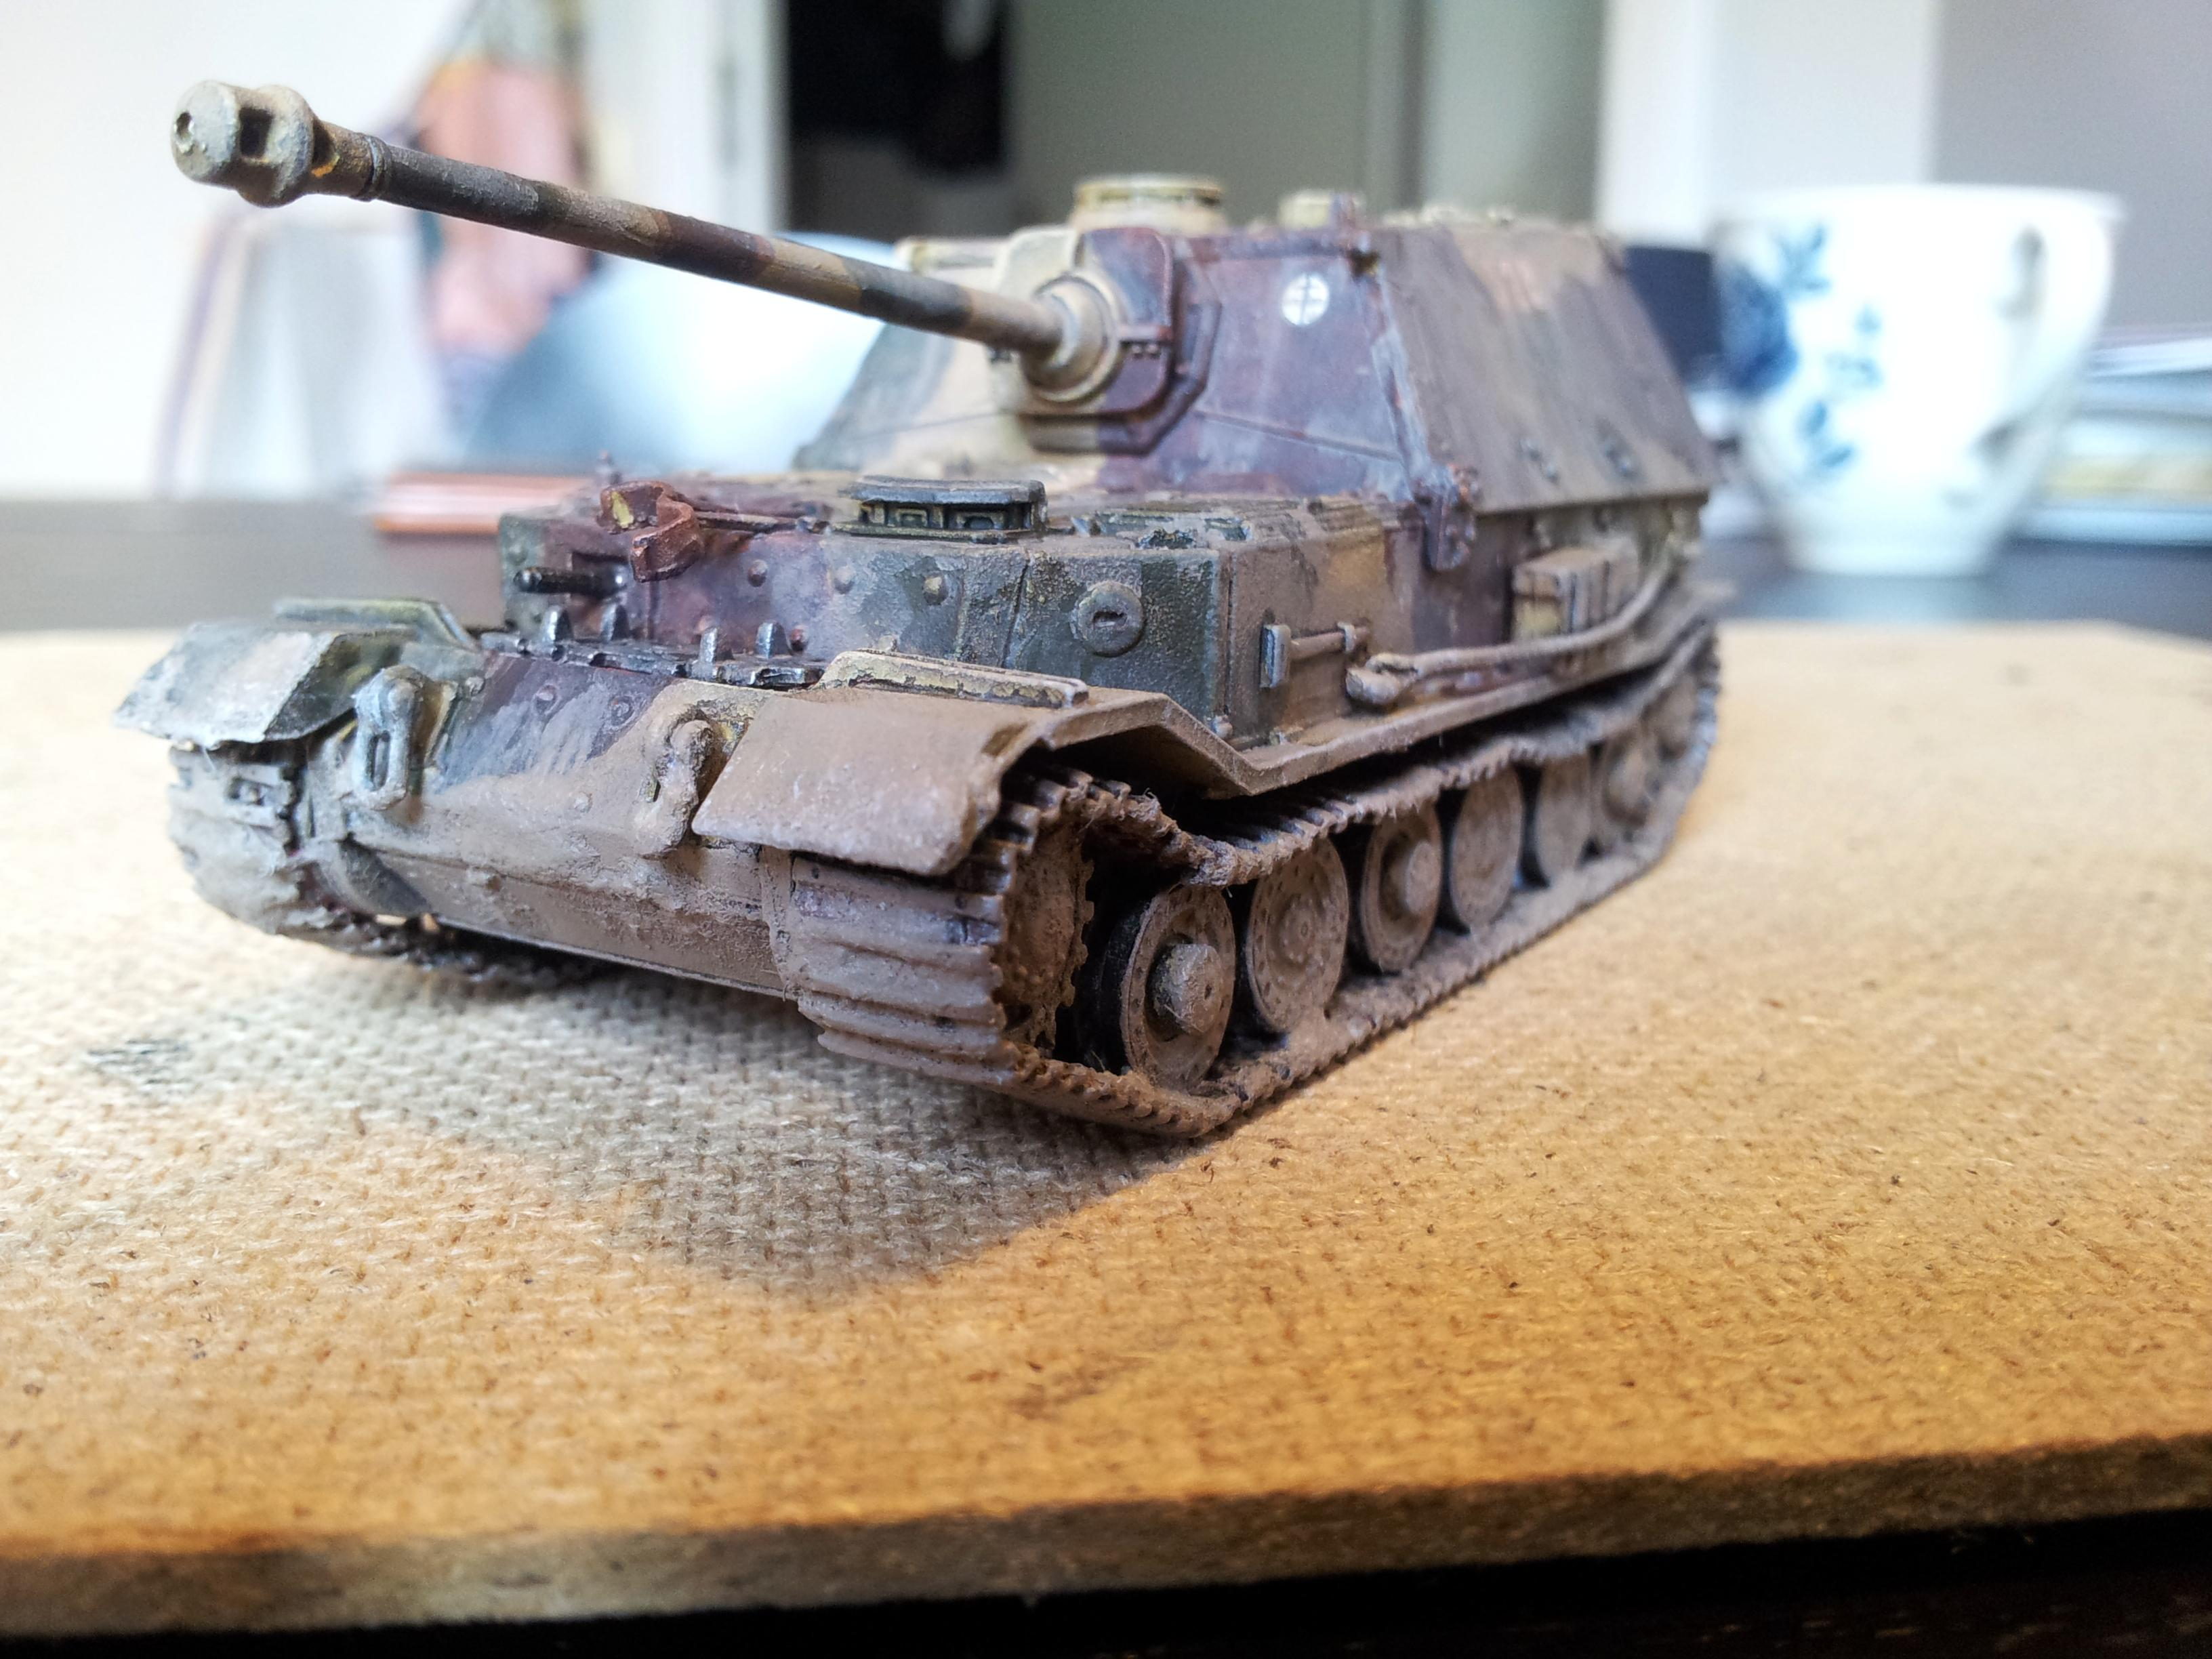 Elephant, Germans, Panzer, Weathered, World War 2